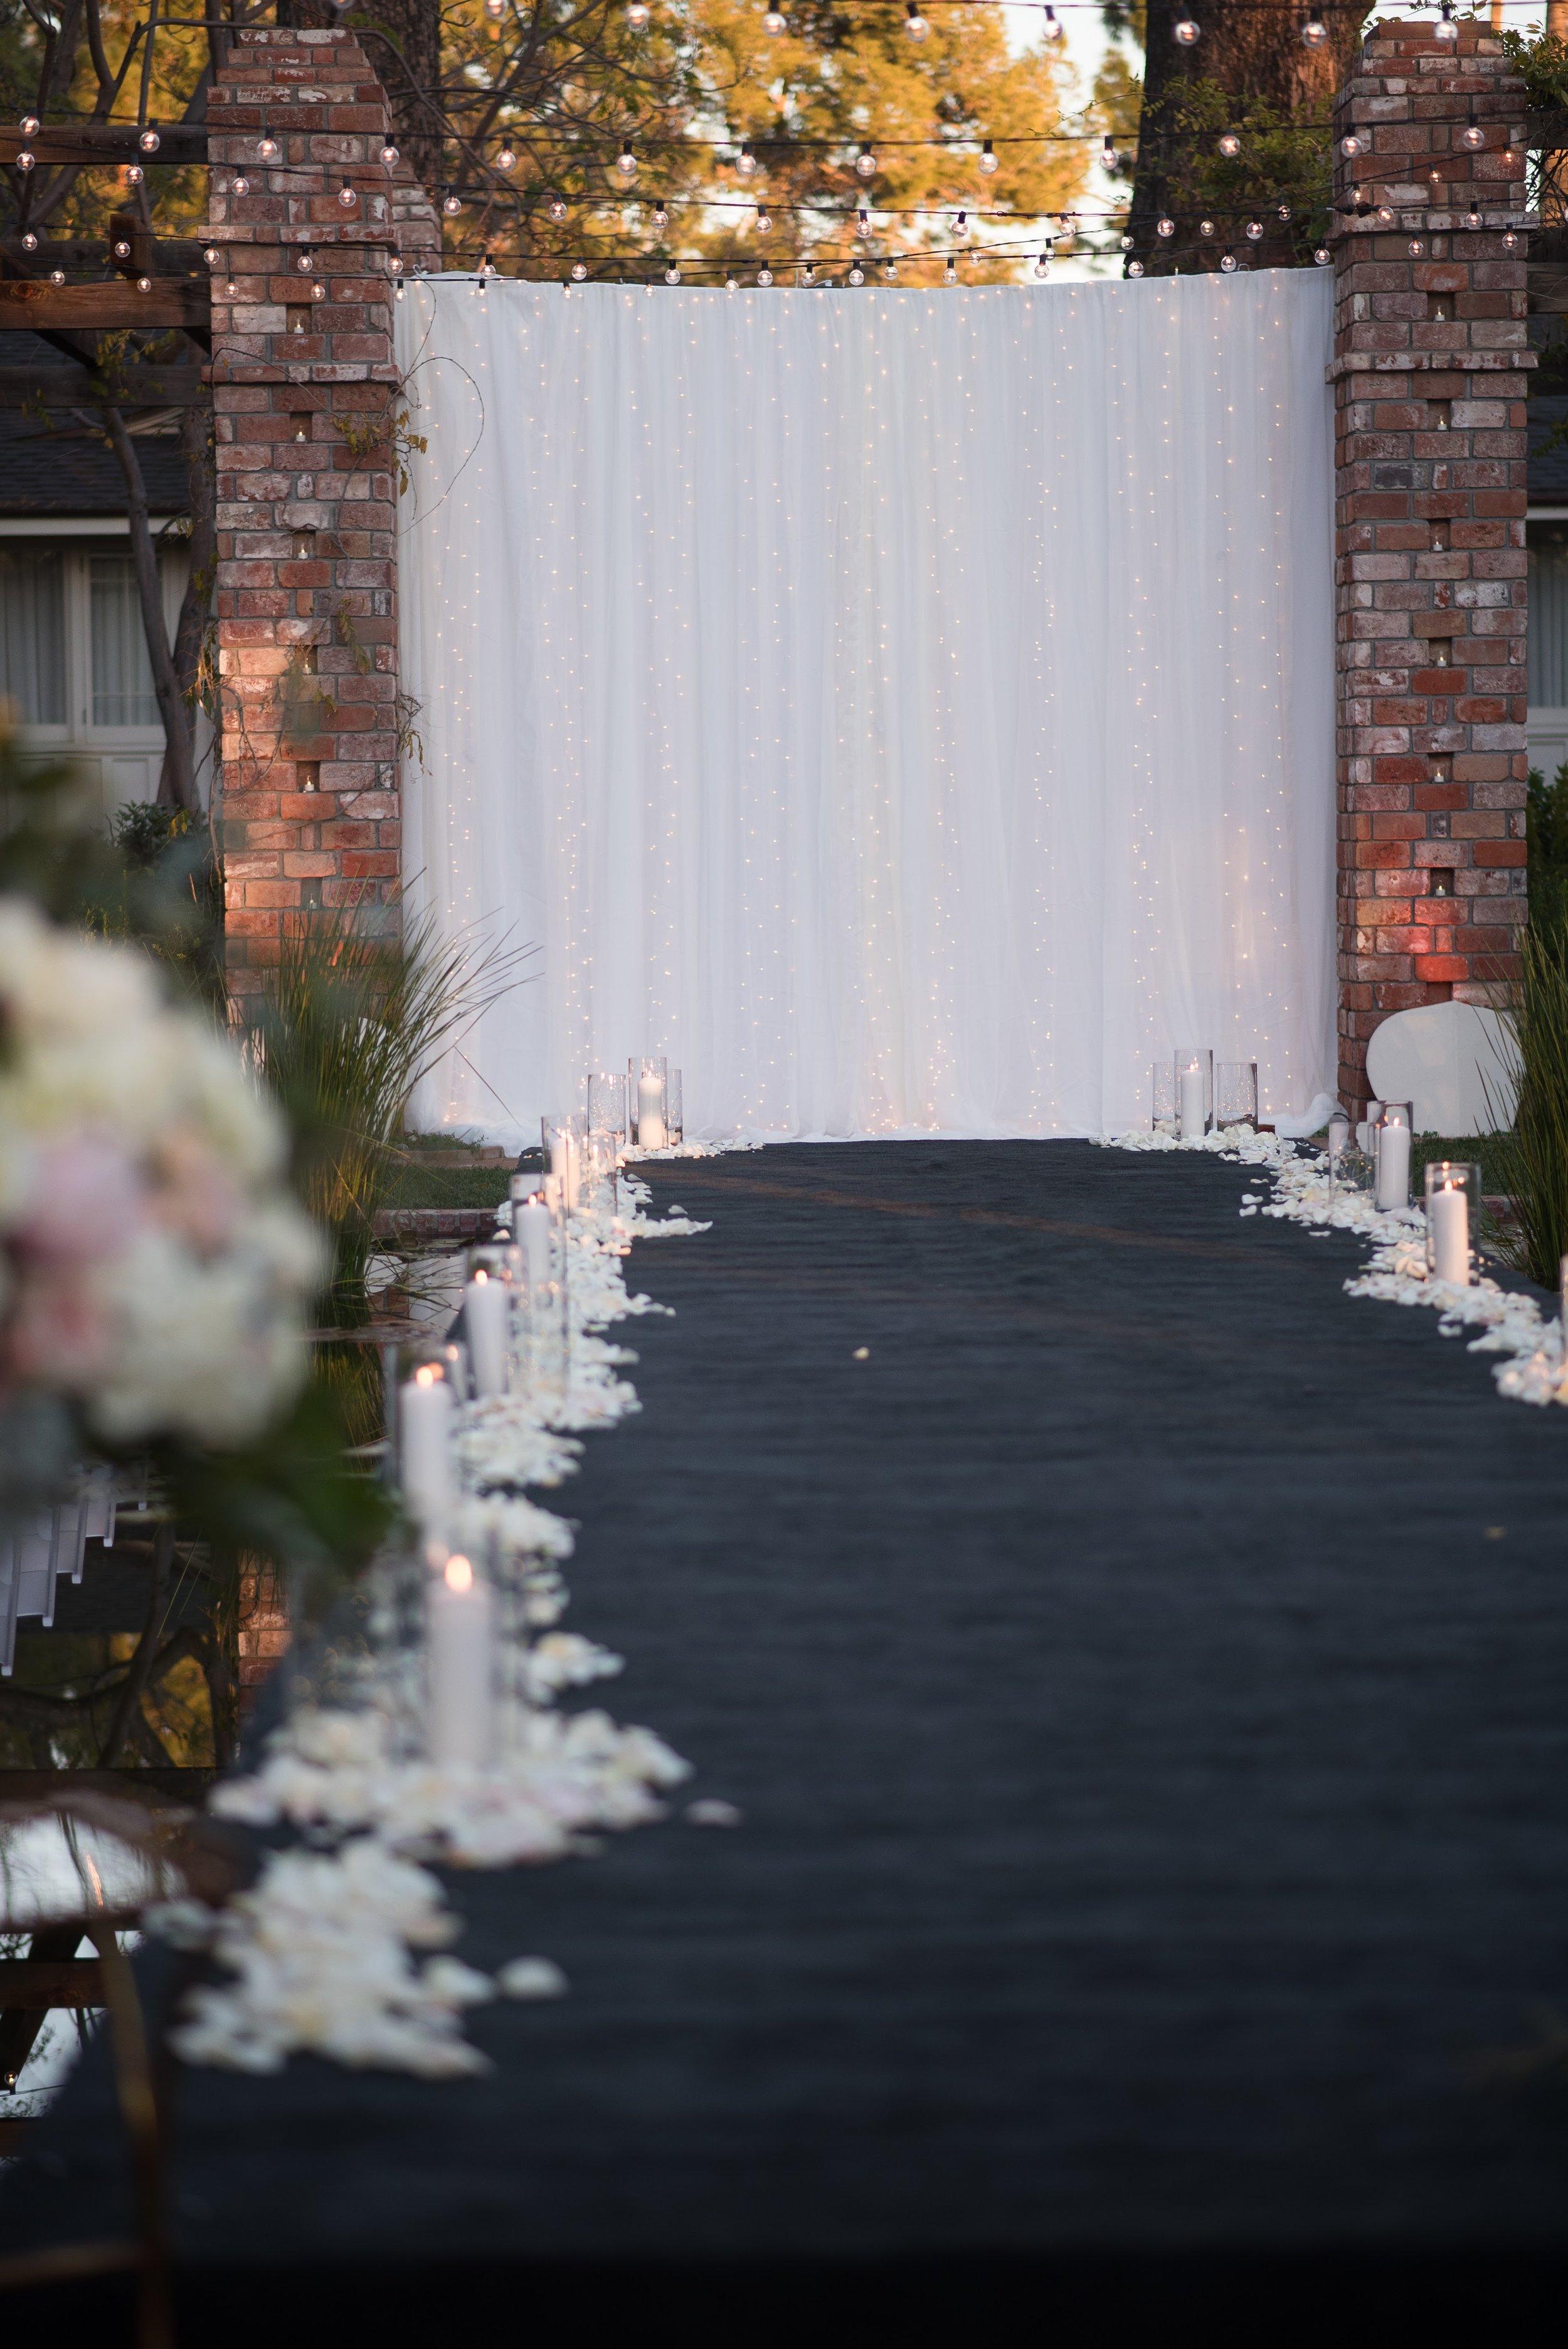 www.santabarbaraweddingstyle.com | Santa Barbara Wedding Style | Precious and Blooming | El Encanto Wedding | Nate and Jenny Weddings | Bellavista Designs | Wedding Aisle | Ceremony Decor